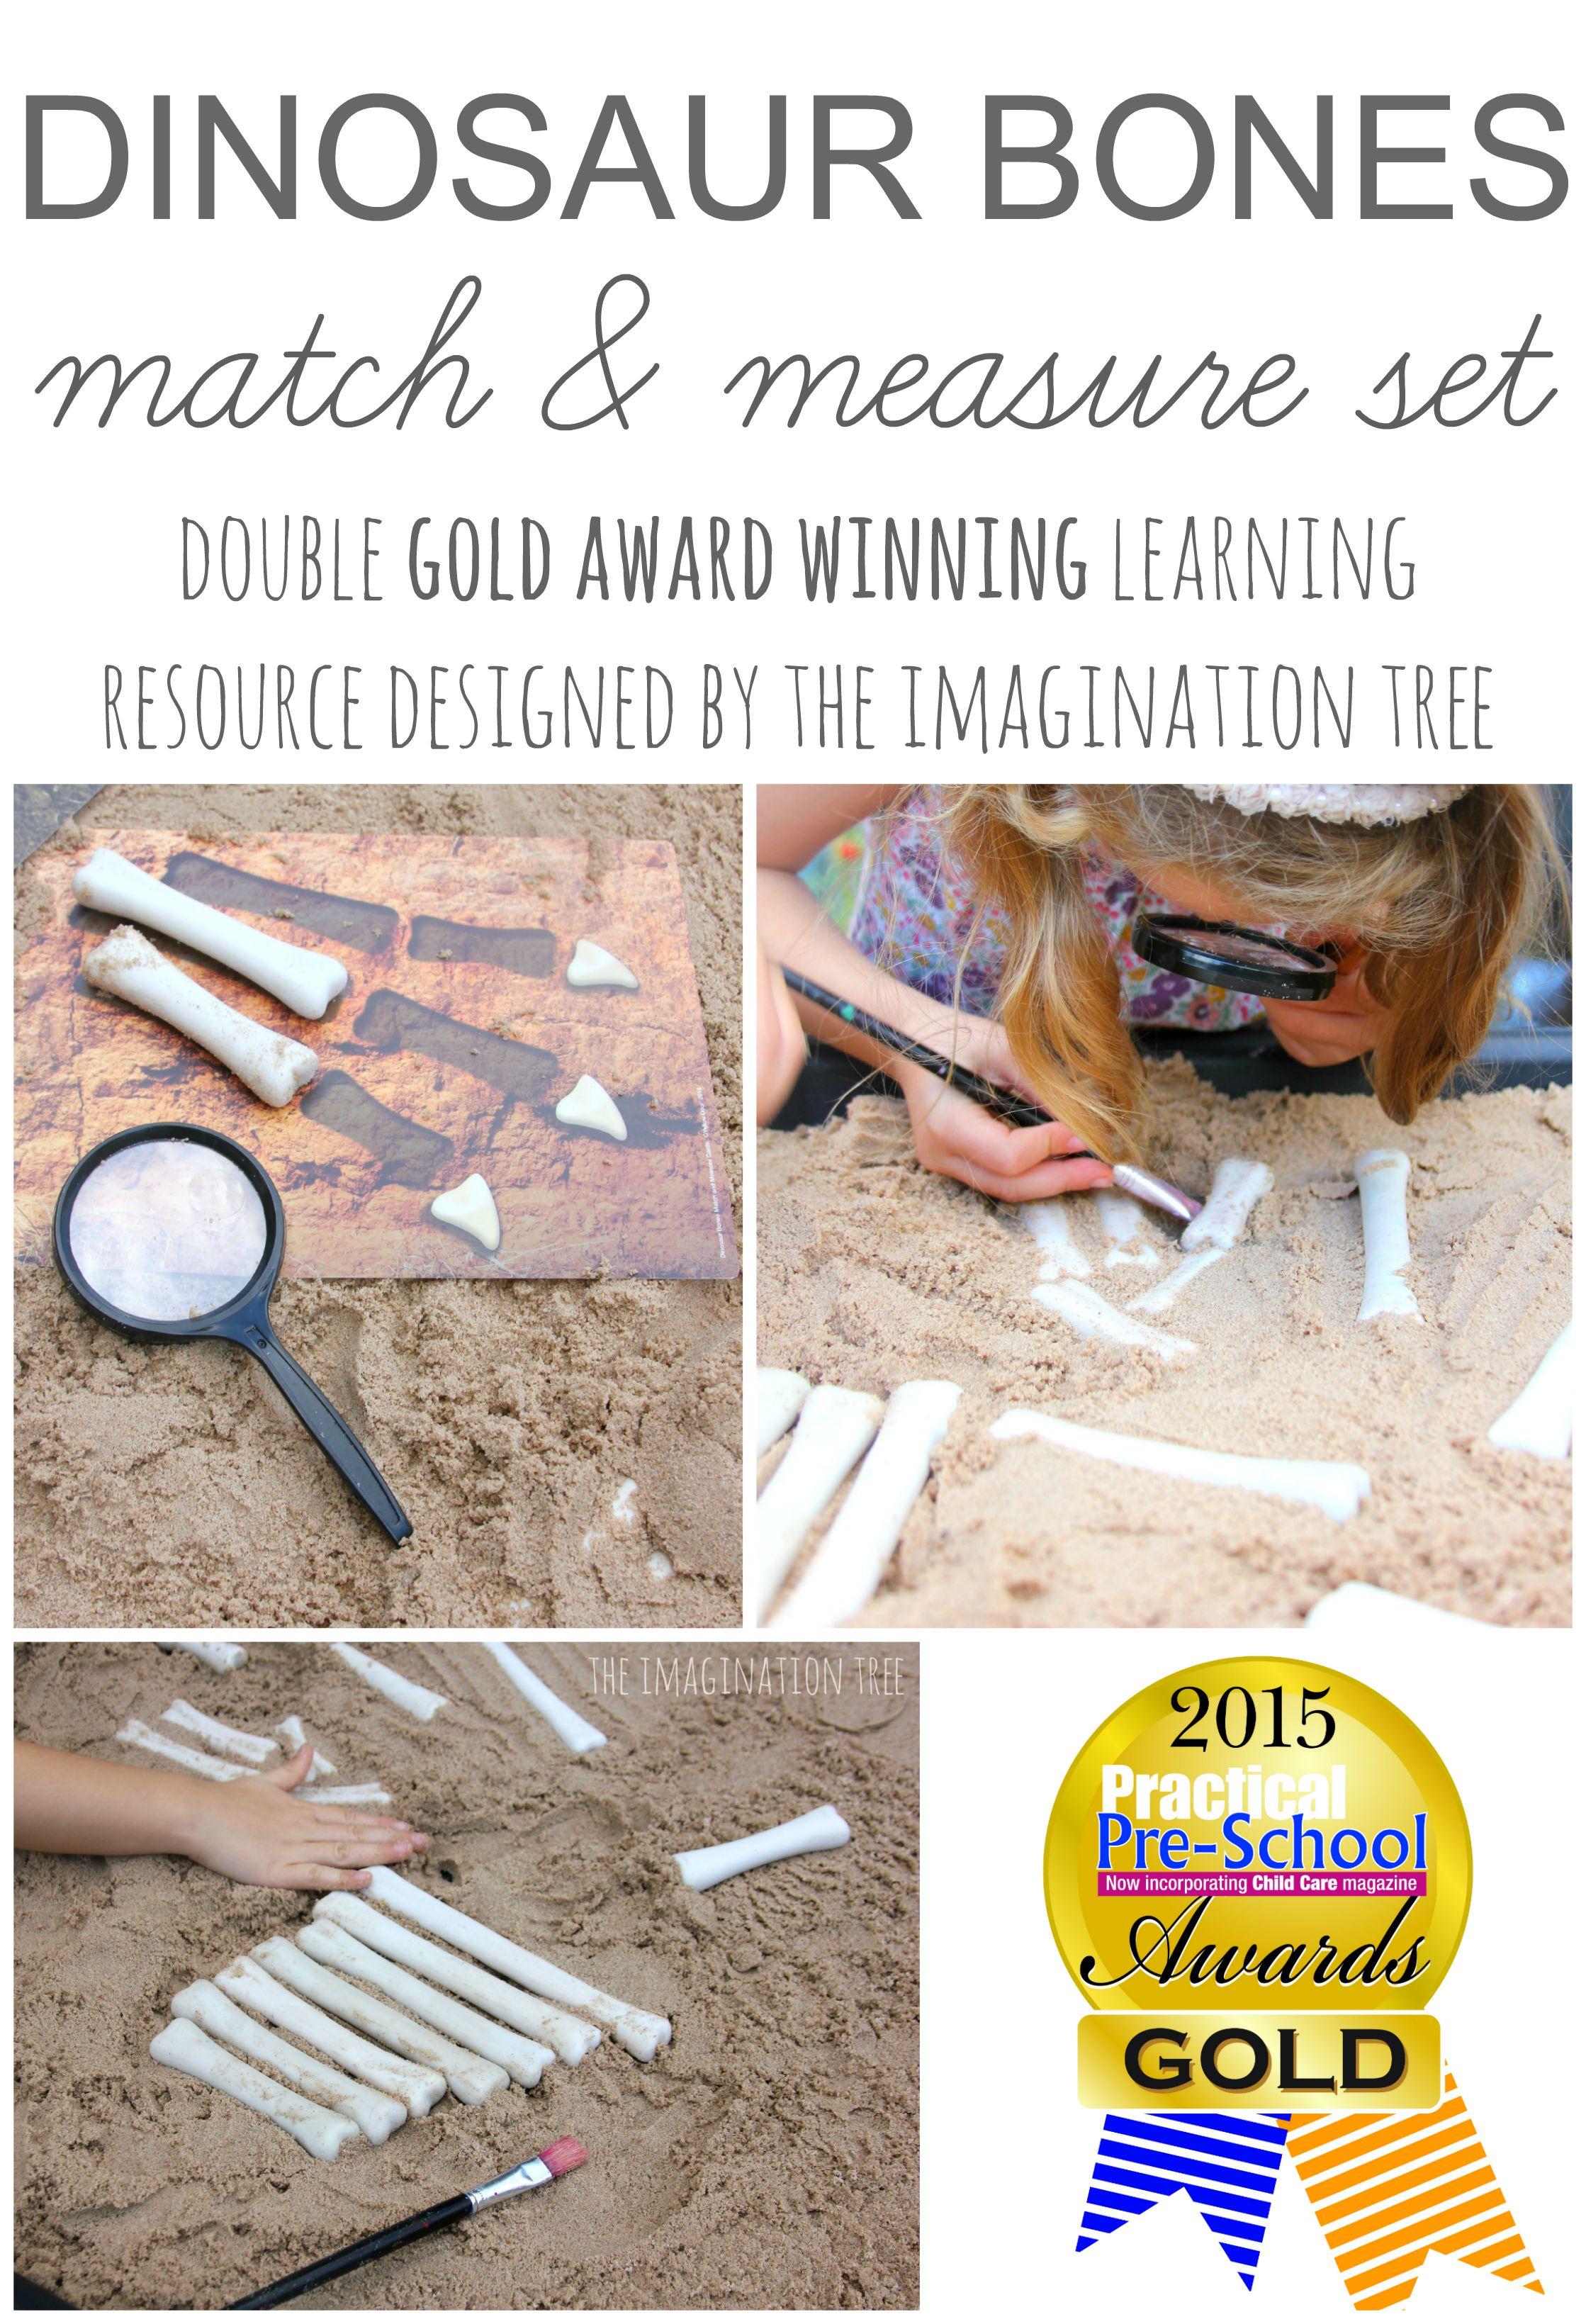 Dinosaur Bones Match And Measure Set The Imagination Tree